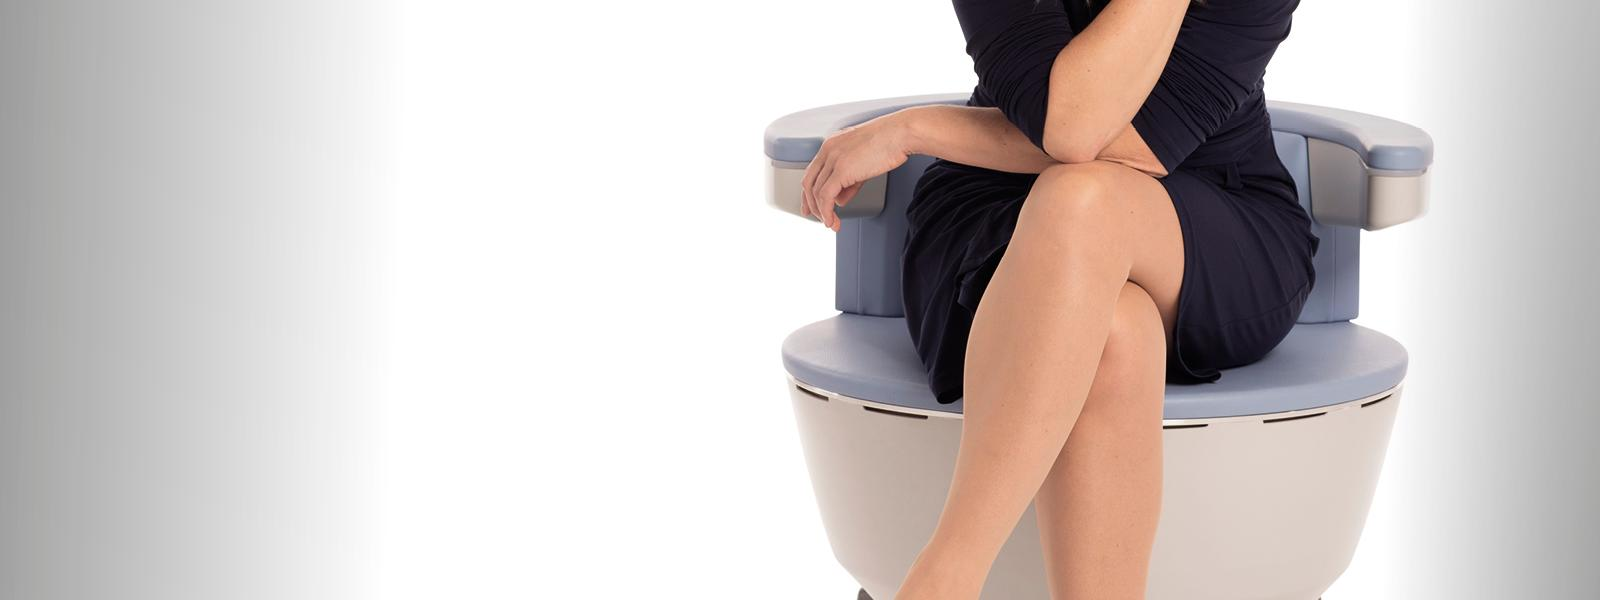 ¿Problemas de incontinencia? Descubre la solución definitiva